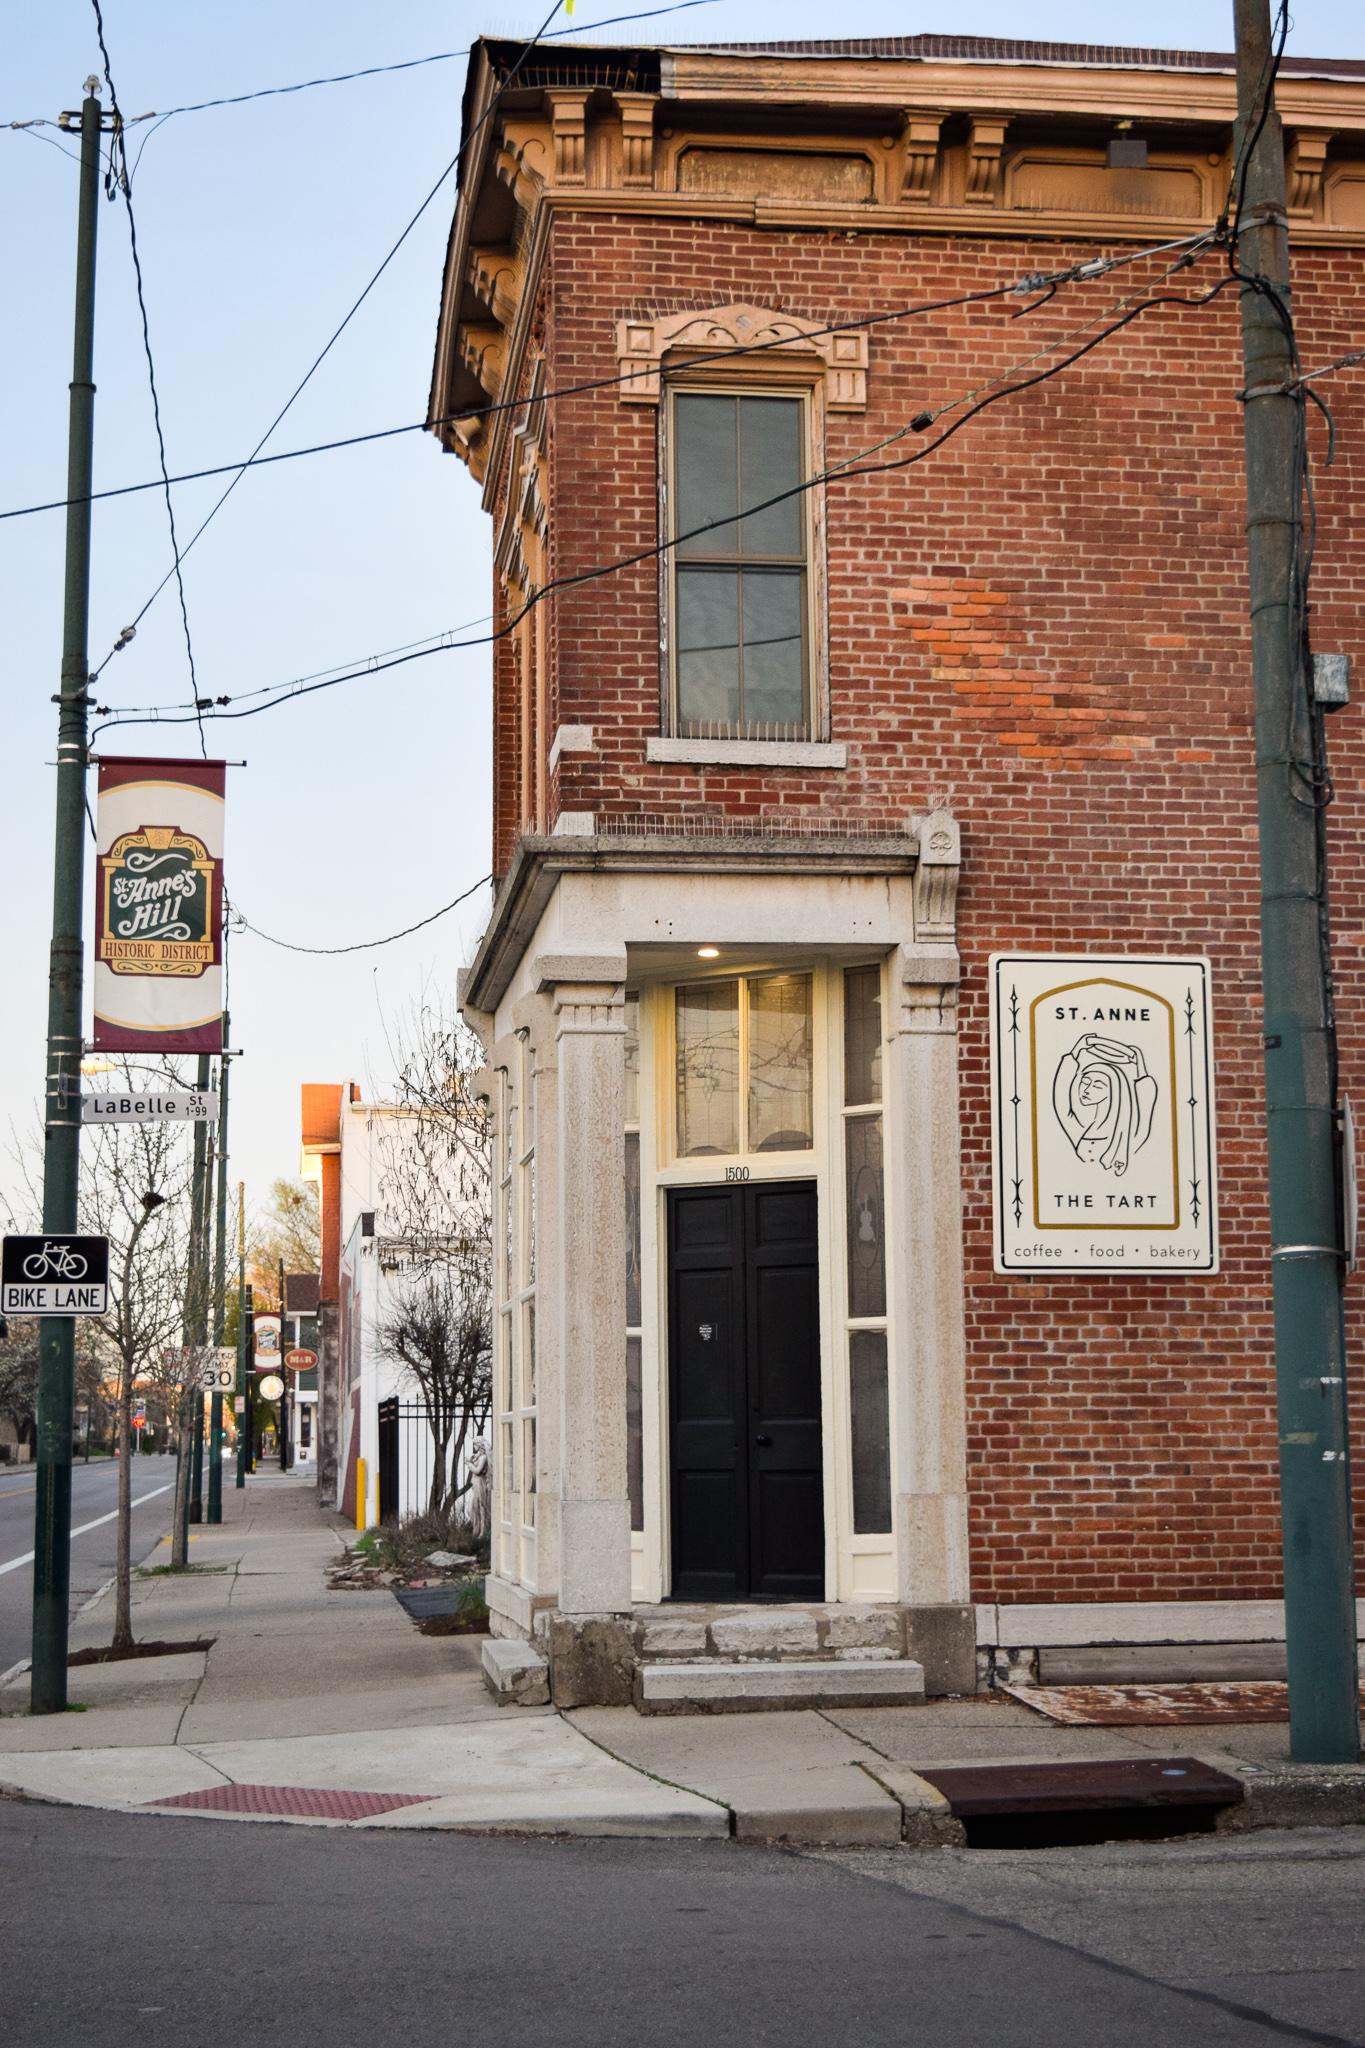 St Anne the Tart in Downtown Dayton / Photograph: Jessica Fugett